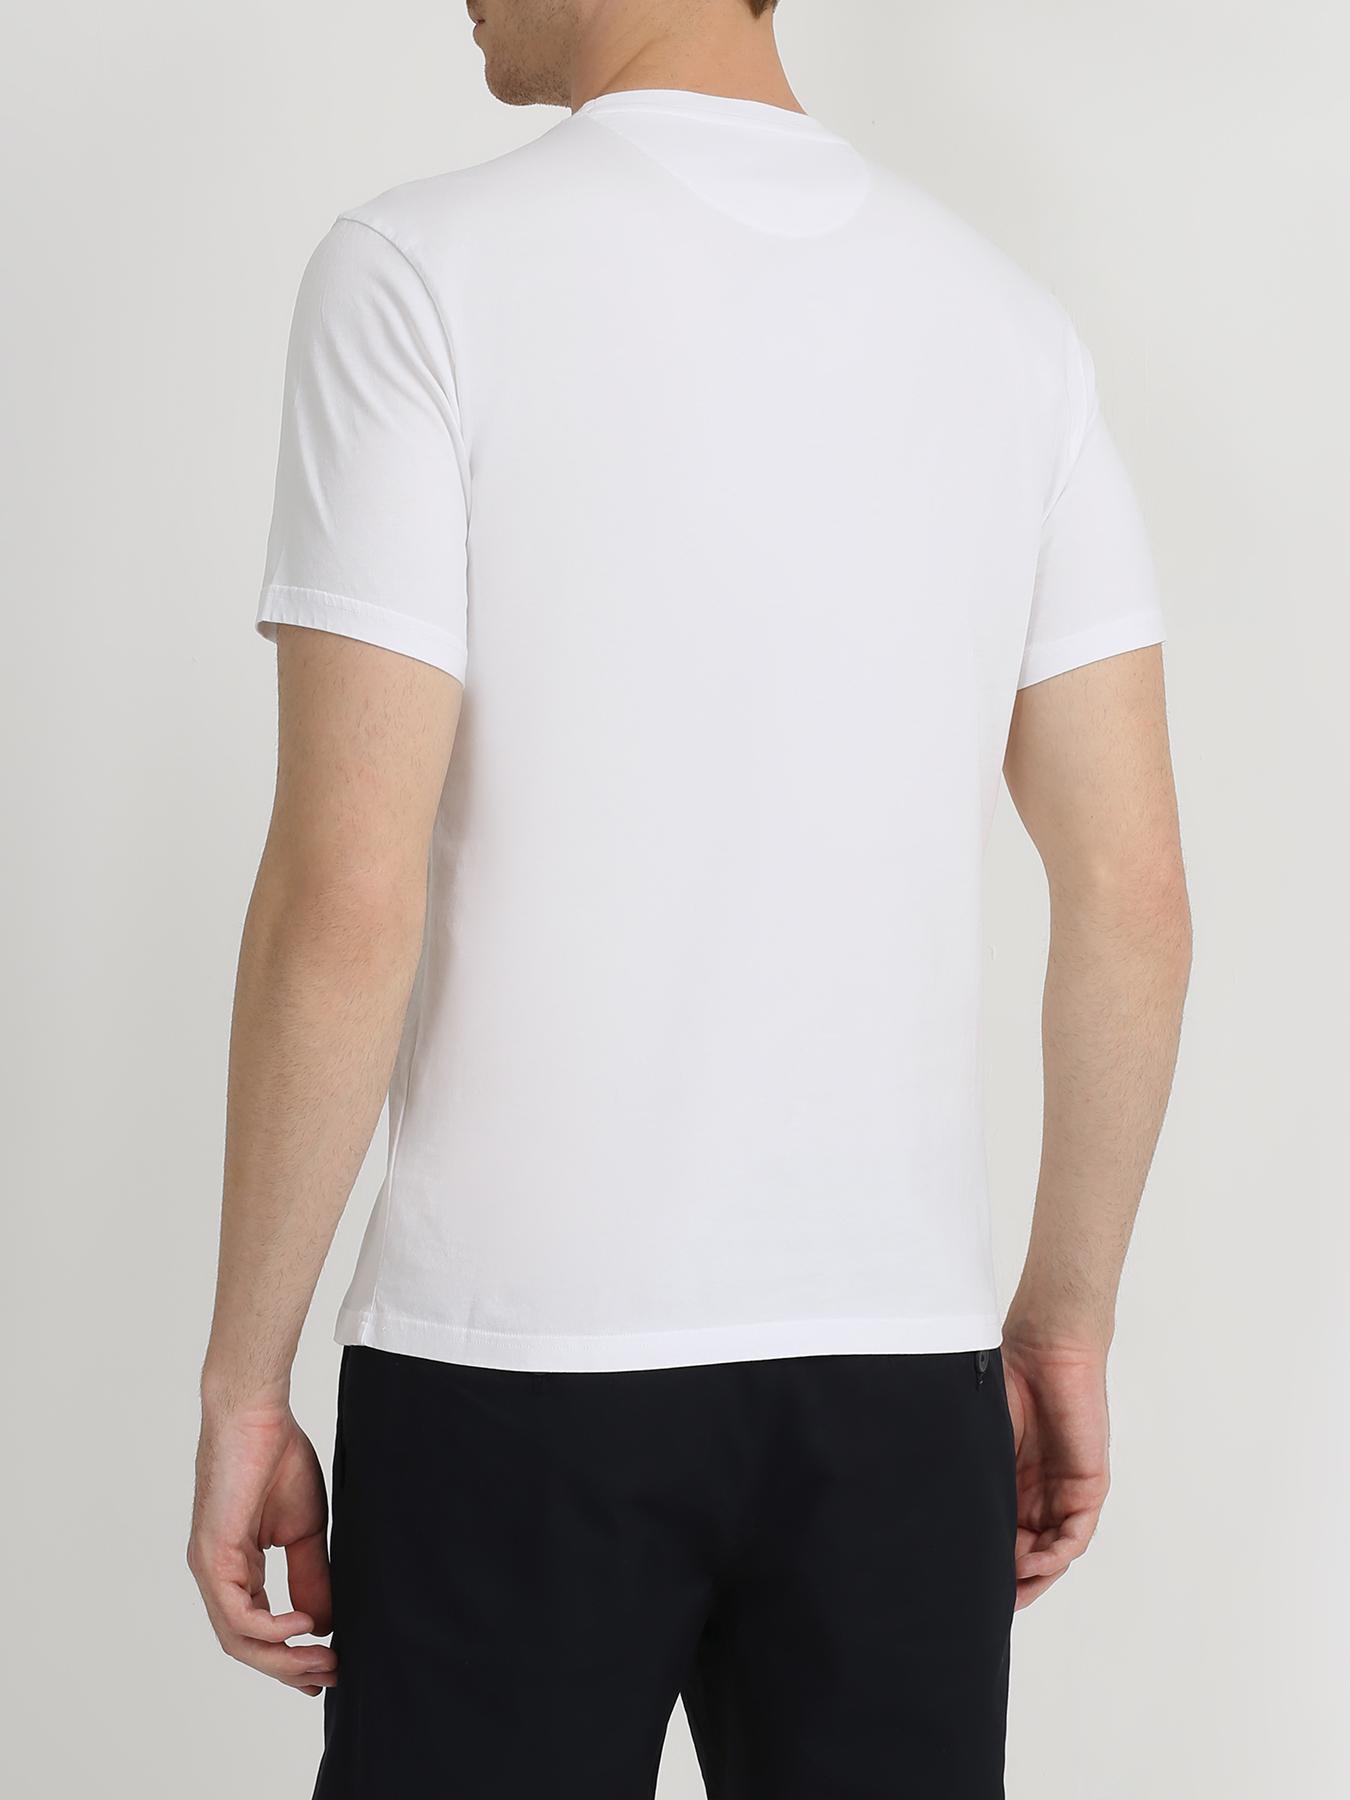 Woolrich Хлопковая футболка 345682-045 Фото 2